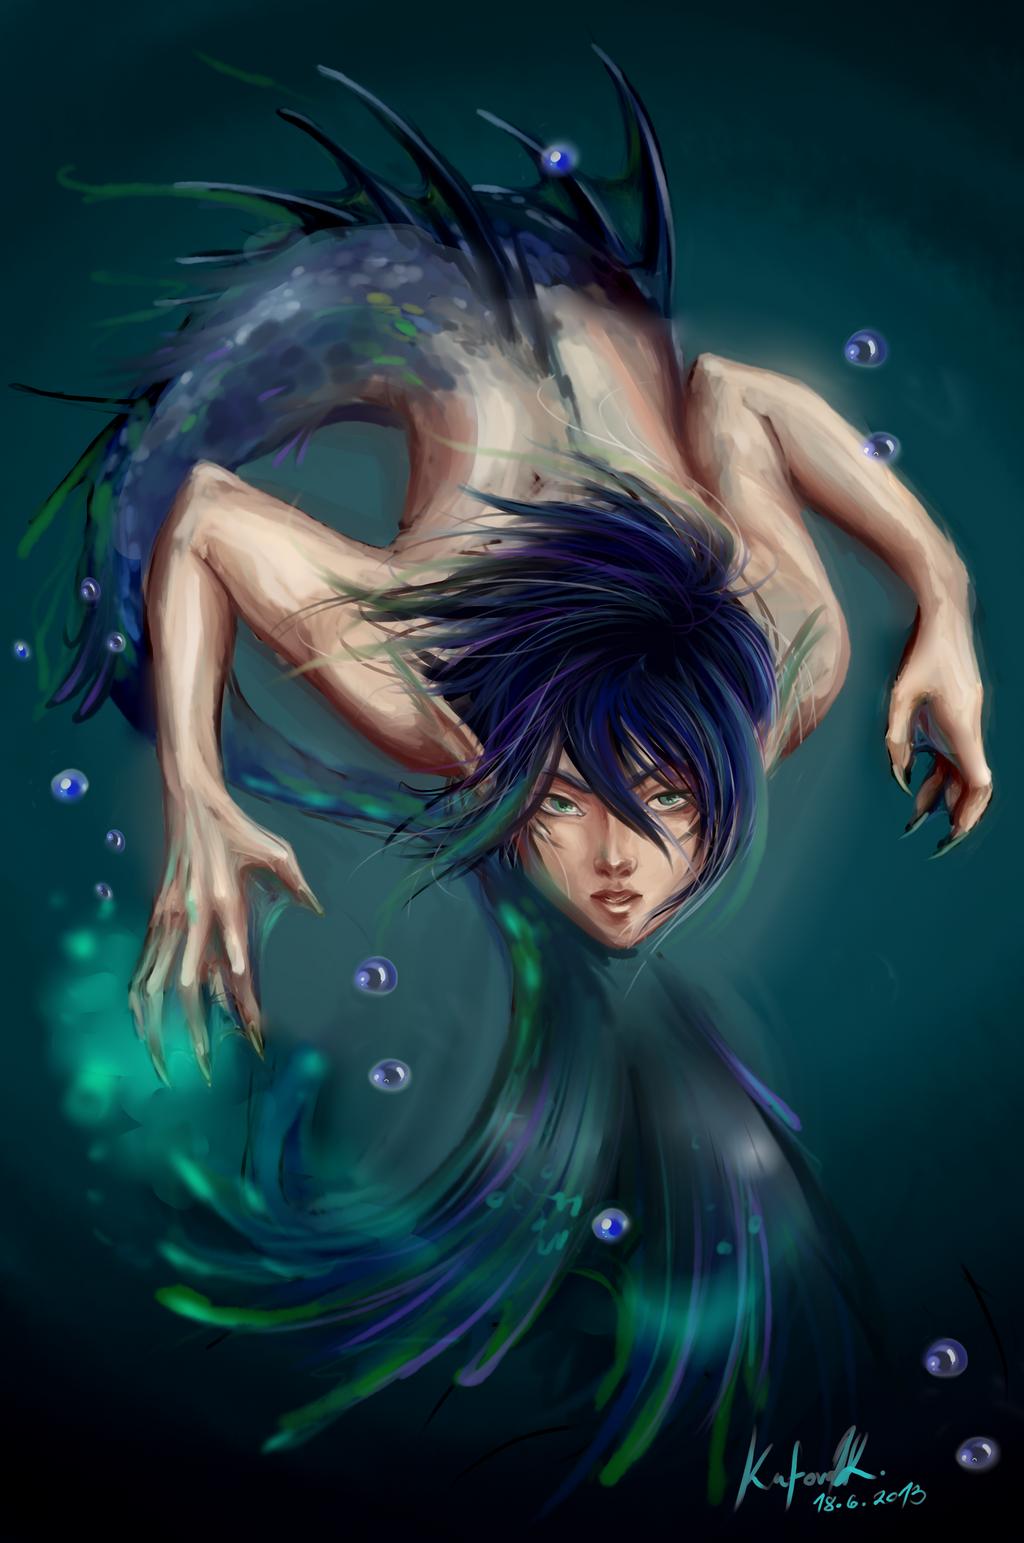 Nickolai Paanee Merman__rin_king_of_the_oceans_by_asano_nee-d69l964